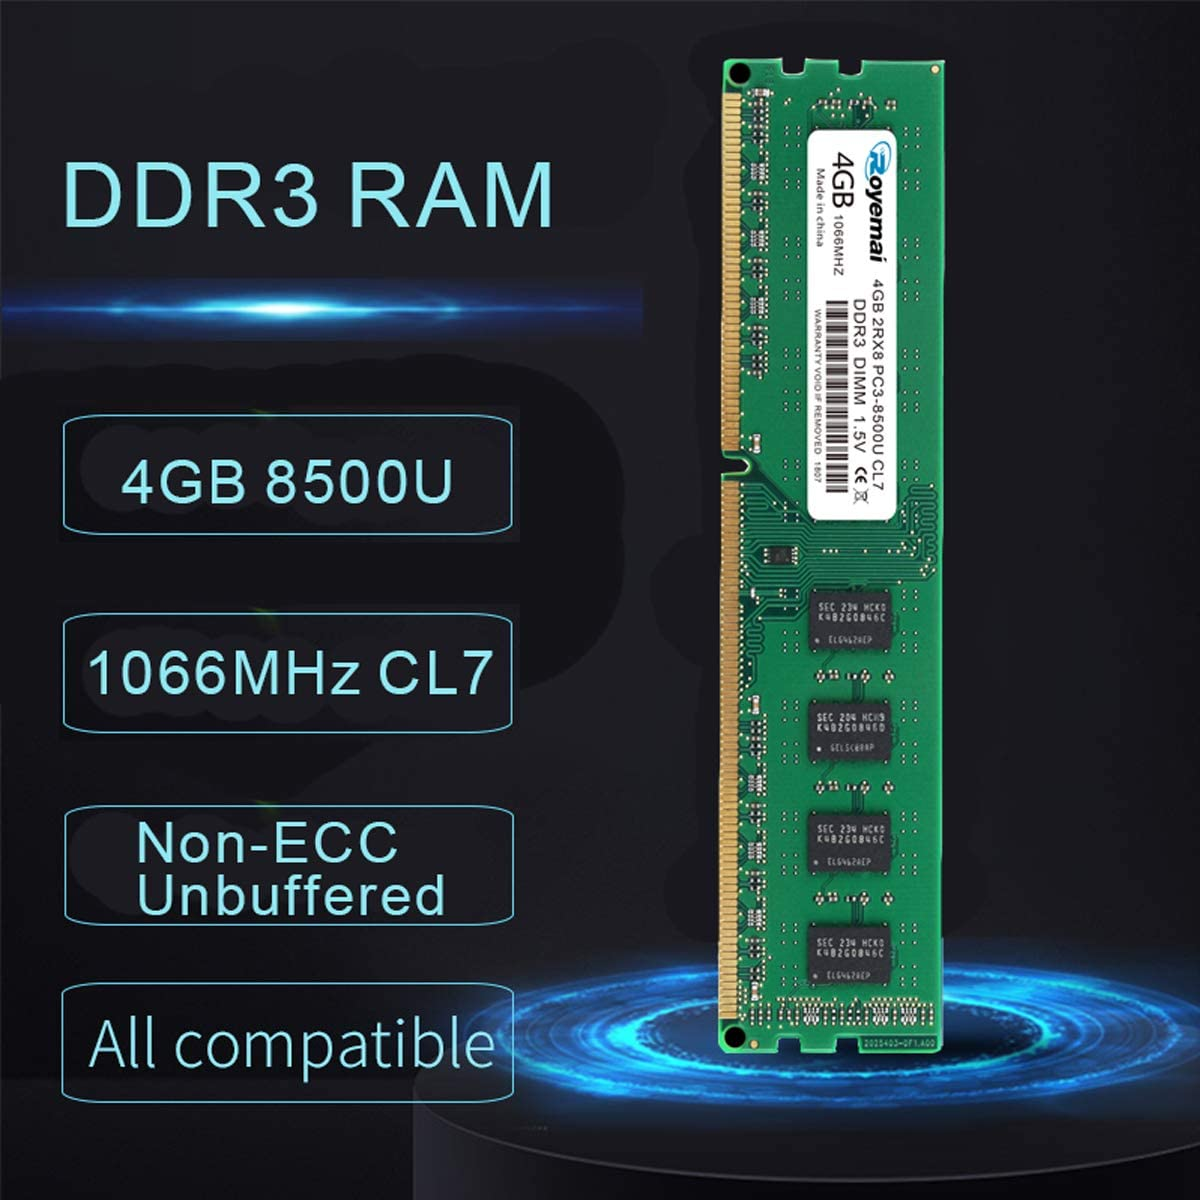 DDR3 1600 MHz PC3 12800U RAM 2Rx8 240-pin 1,5V CL11 Desktop Arbeitsspeicher Upgrade Chips DUOMEIQI 8 GB Kit 2X 4 GB